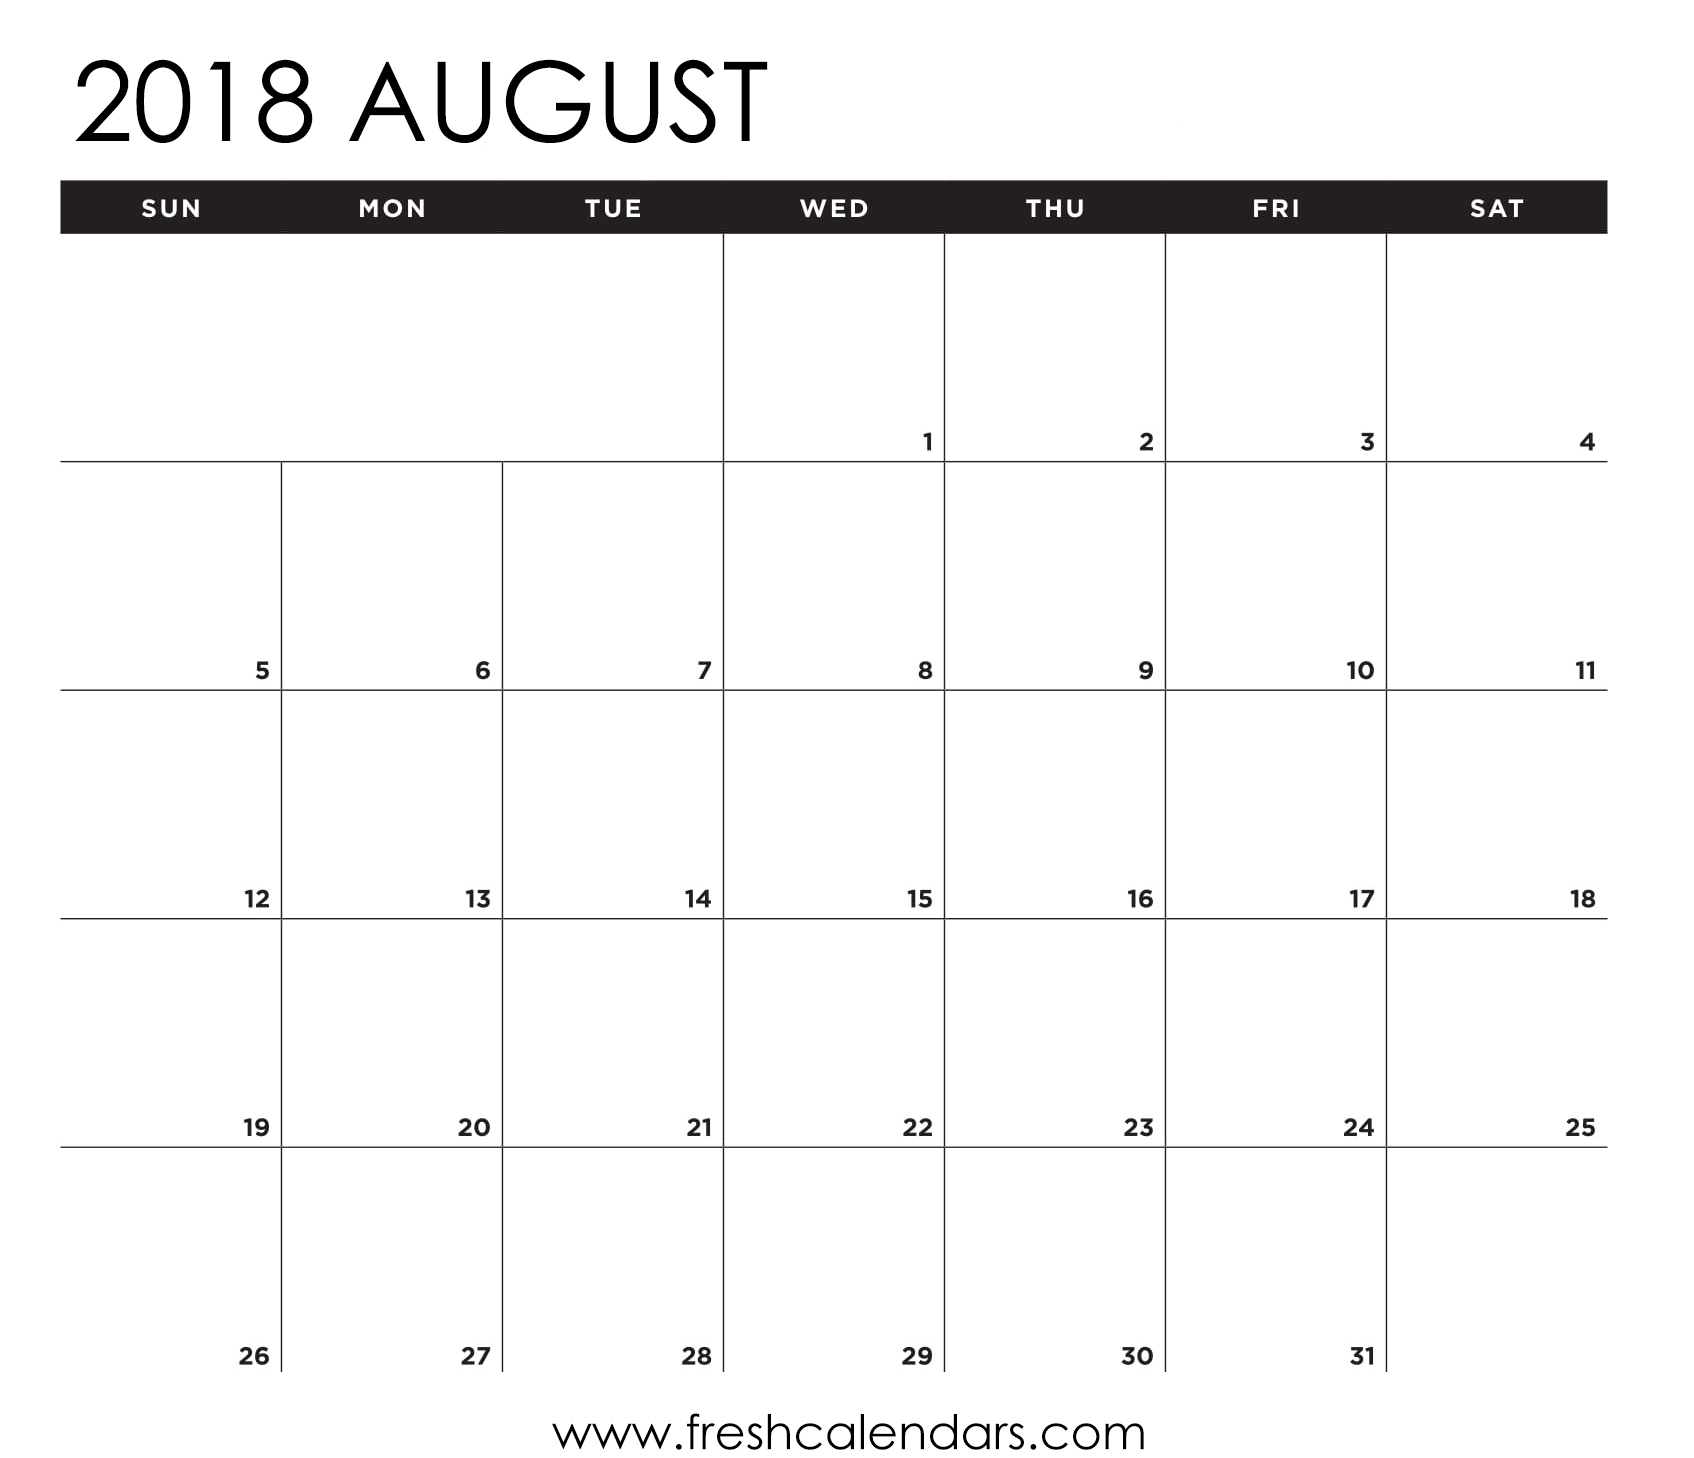 August 2018 Calendar Printable - Fresh Calendars inside Calendar Template For August